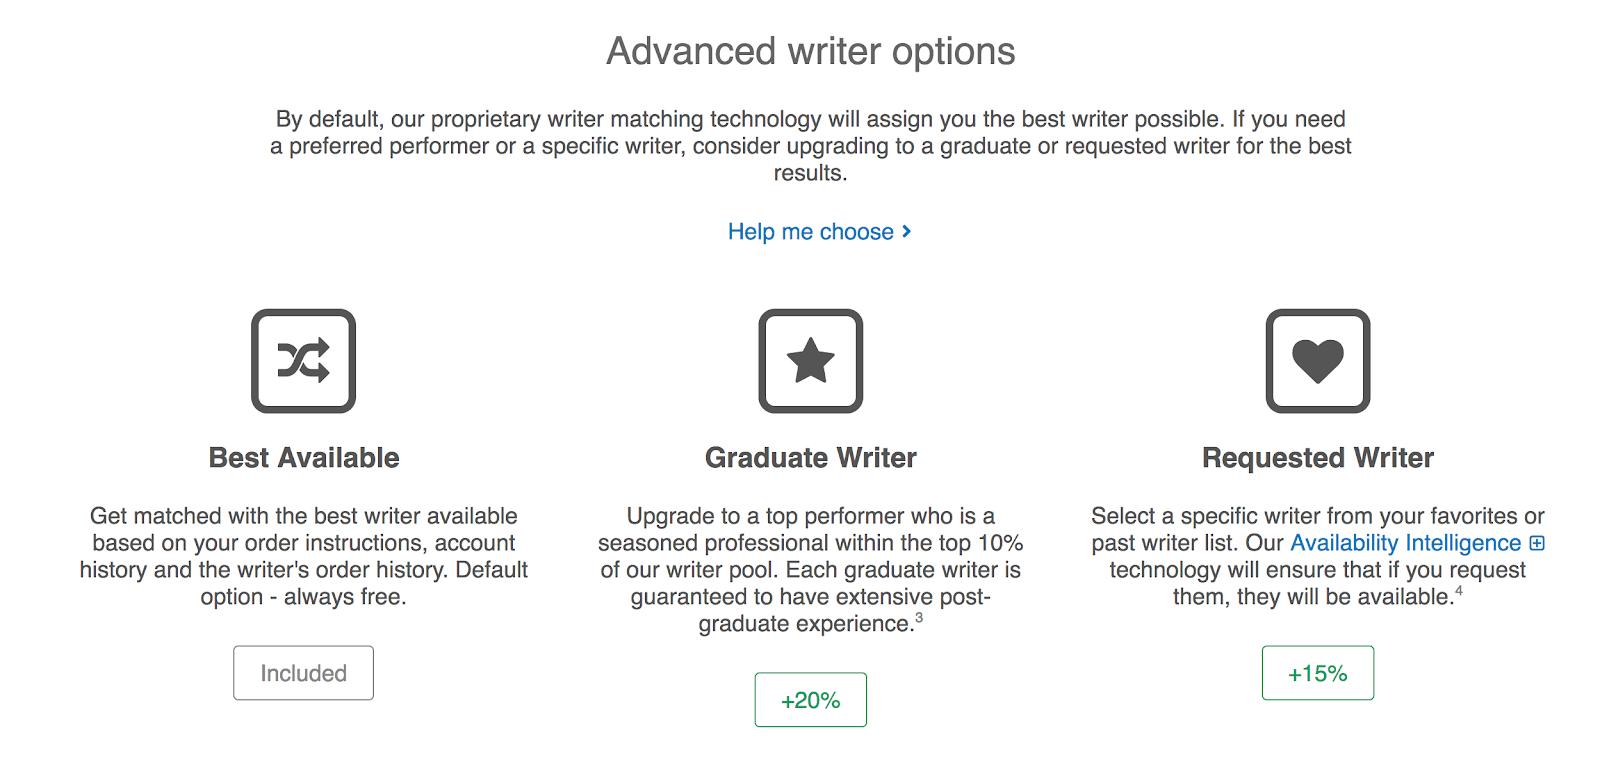 advanced writers options